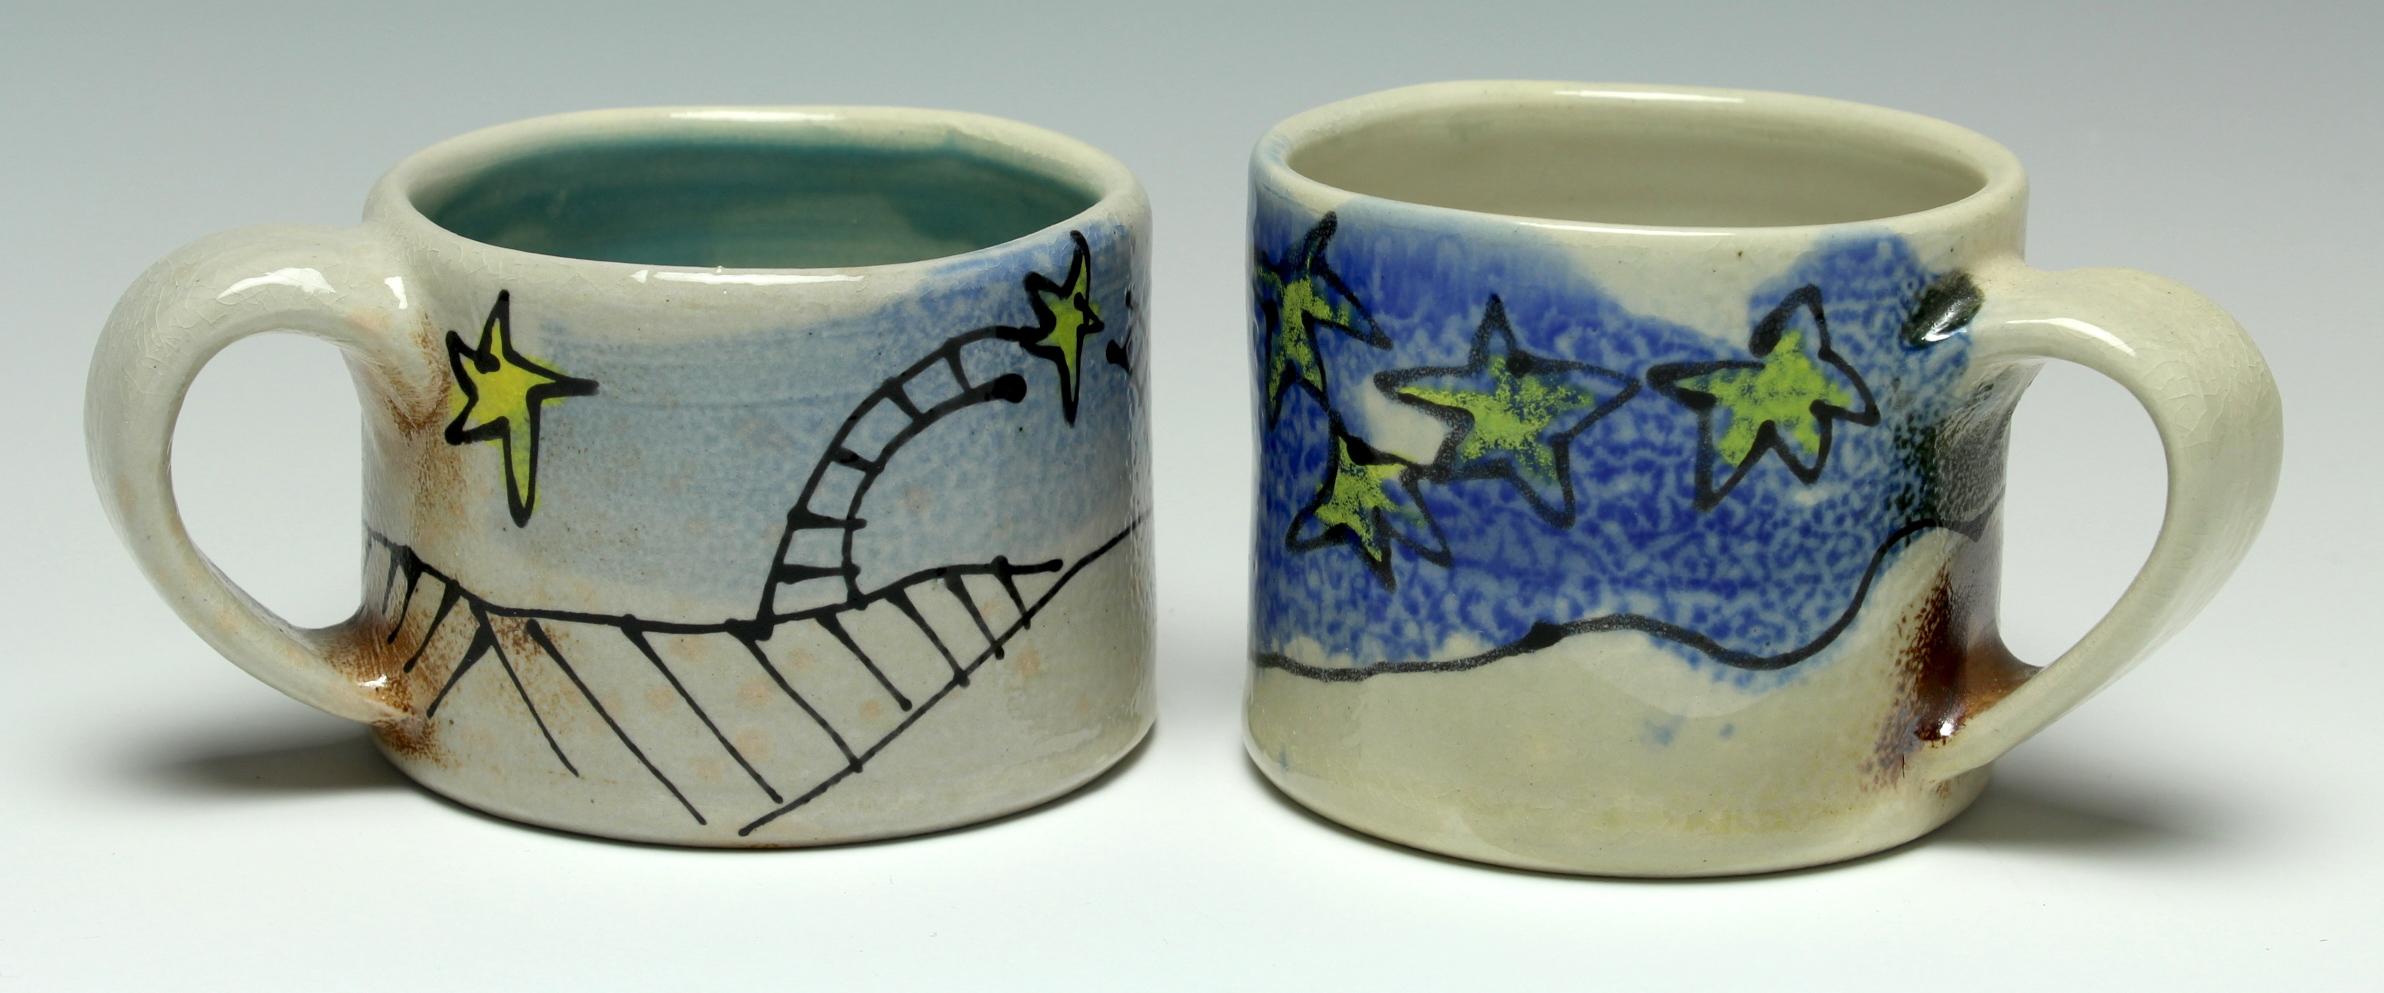 Child's Starry Mugs